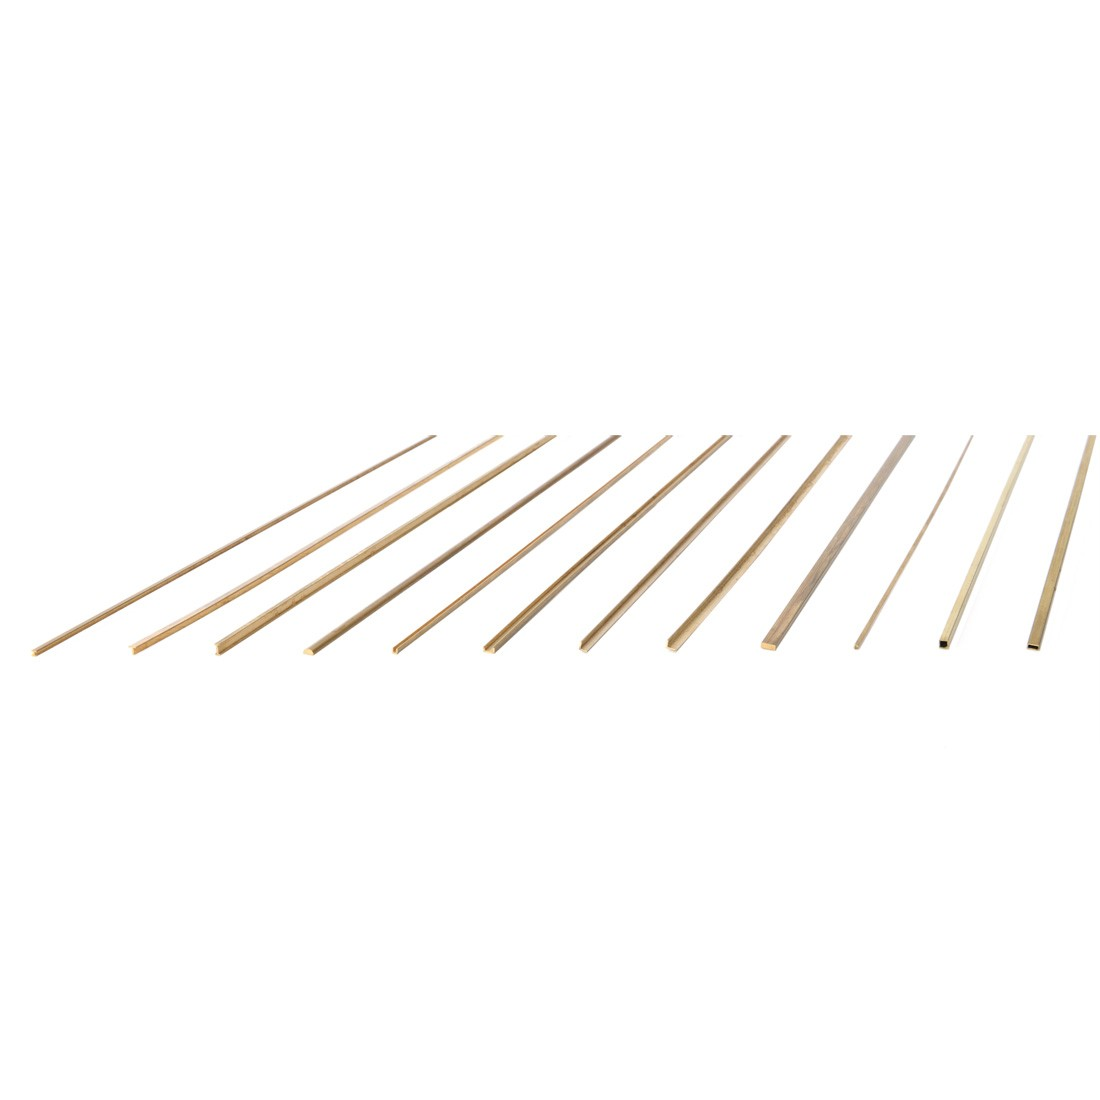 Tubetto Ottone mm. 2x2x500 sez. quadra spess. 0,3